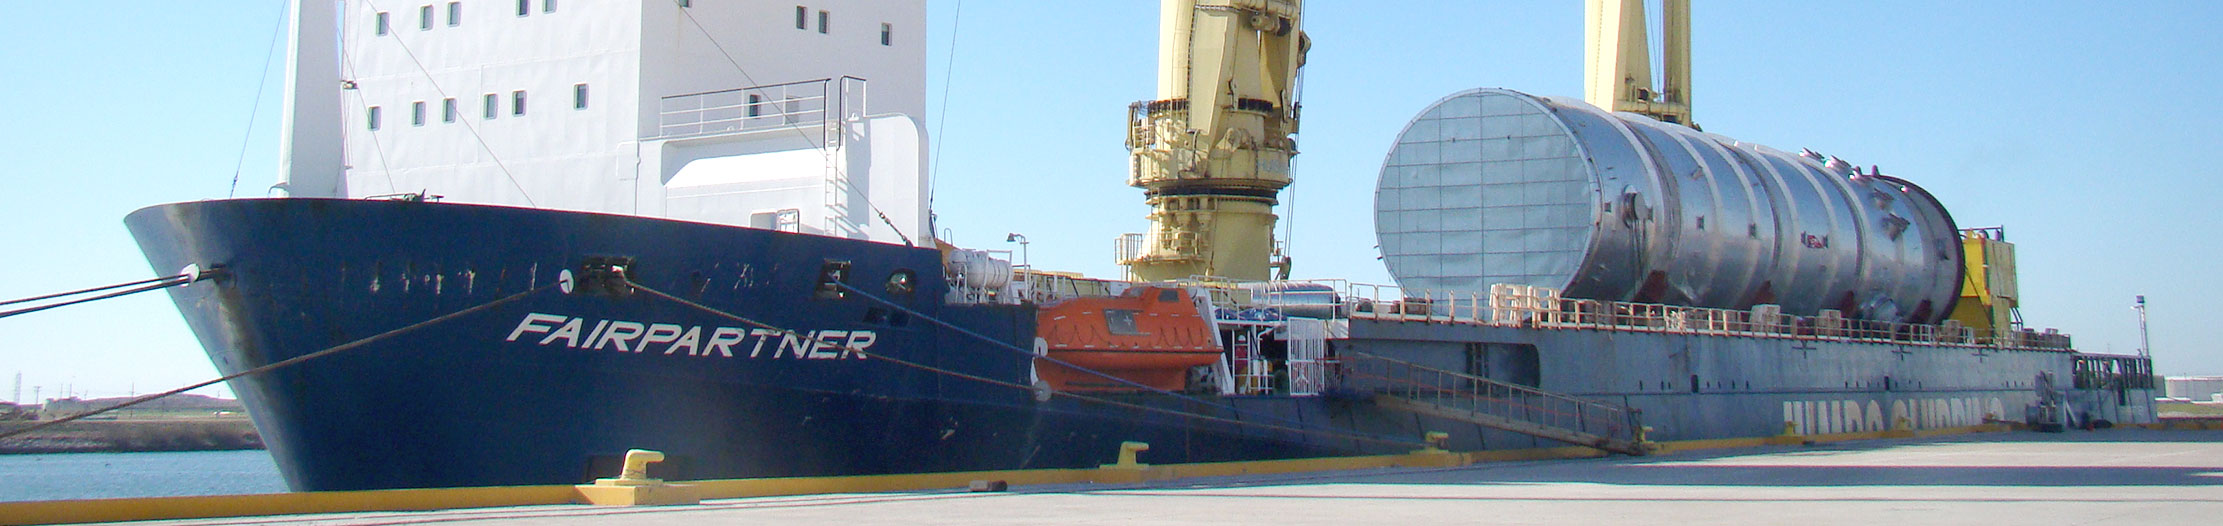 port freeport facilites